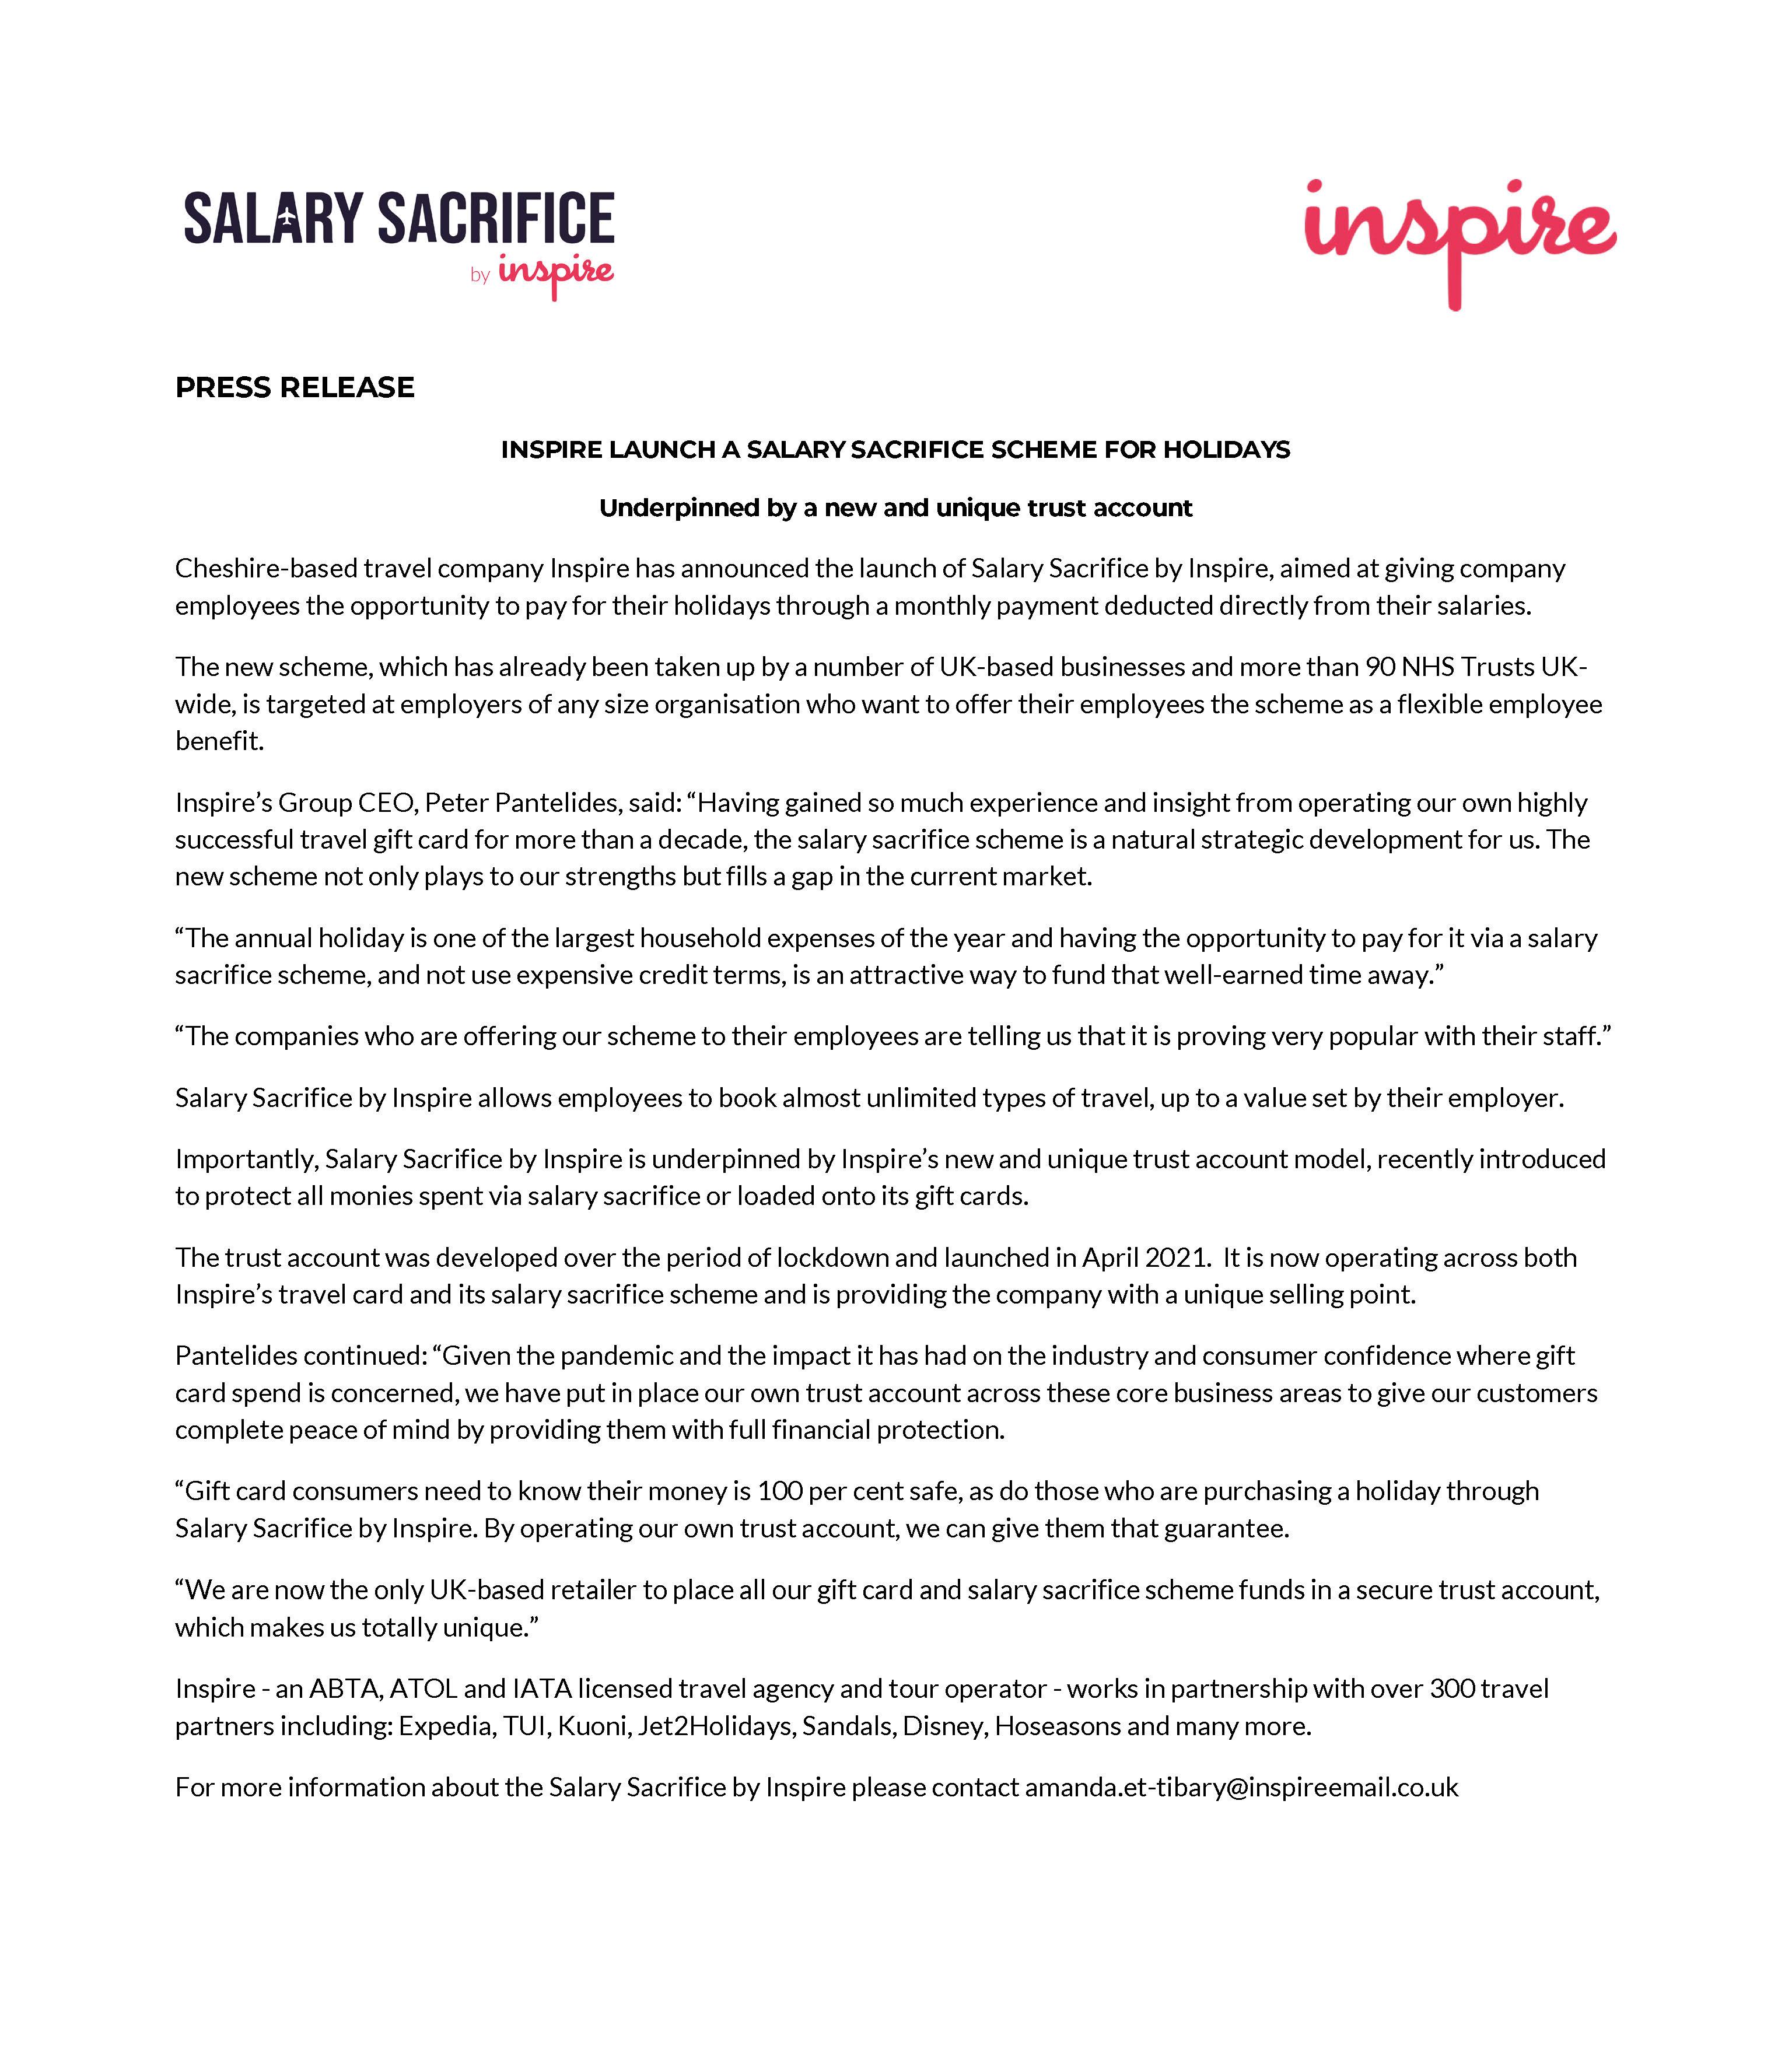 Salary Sacrifice by Inspire